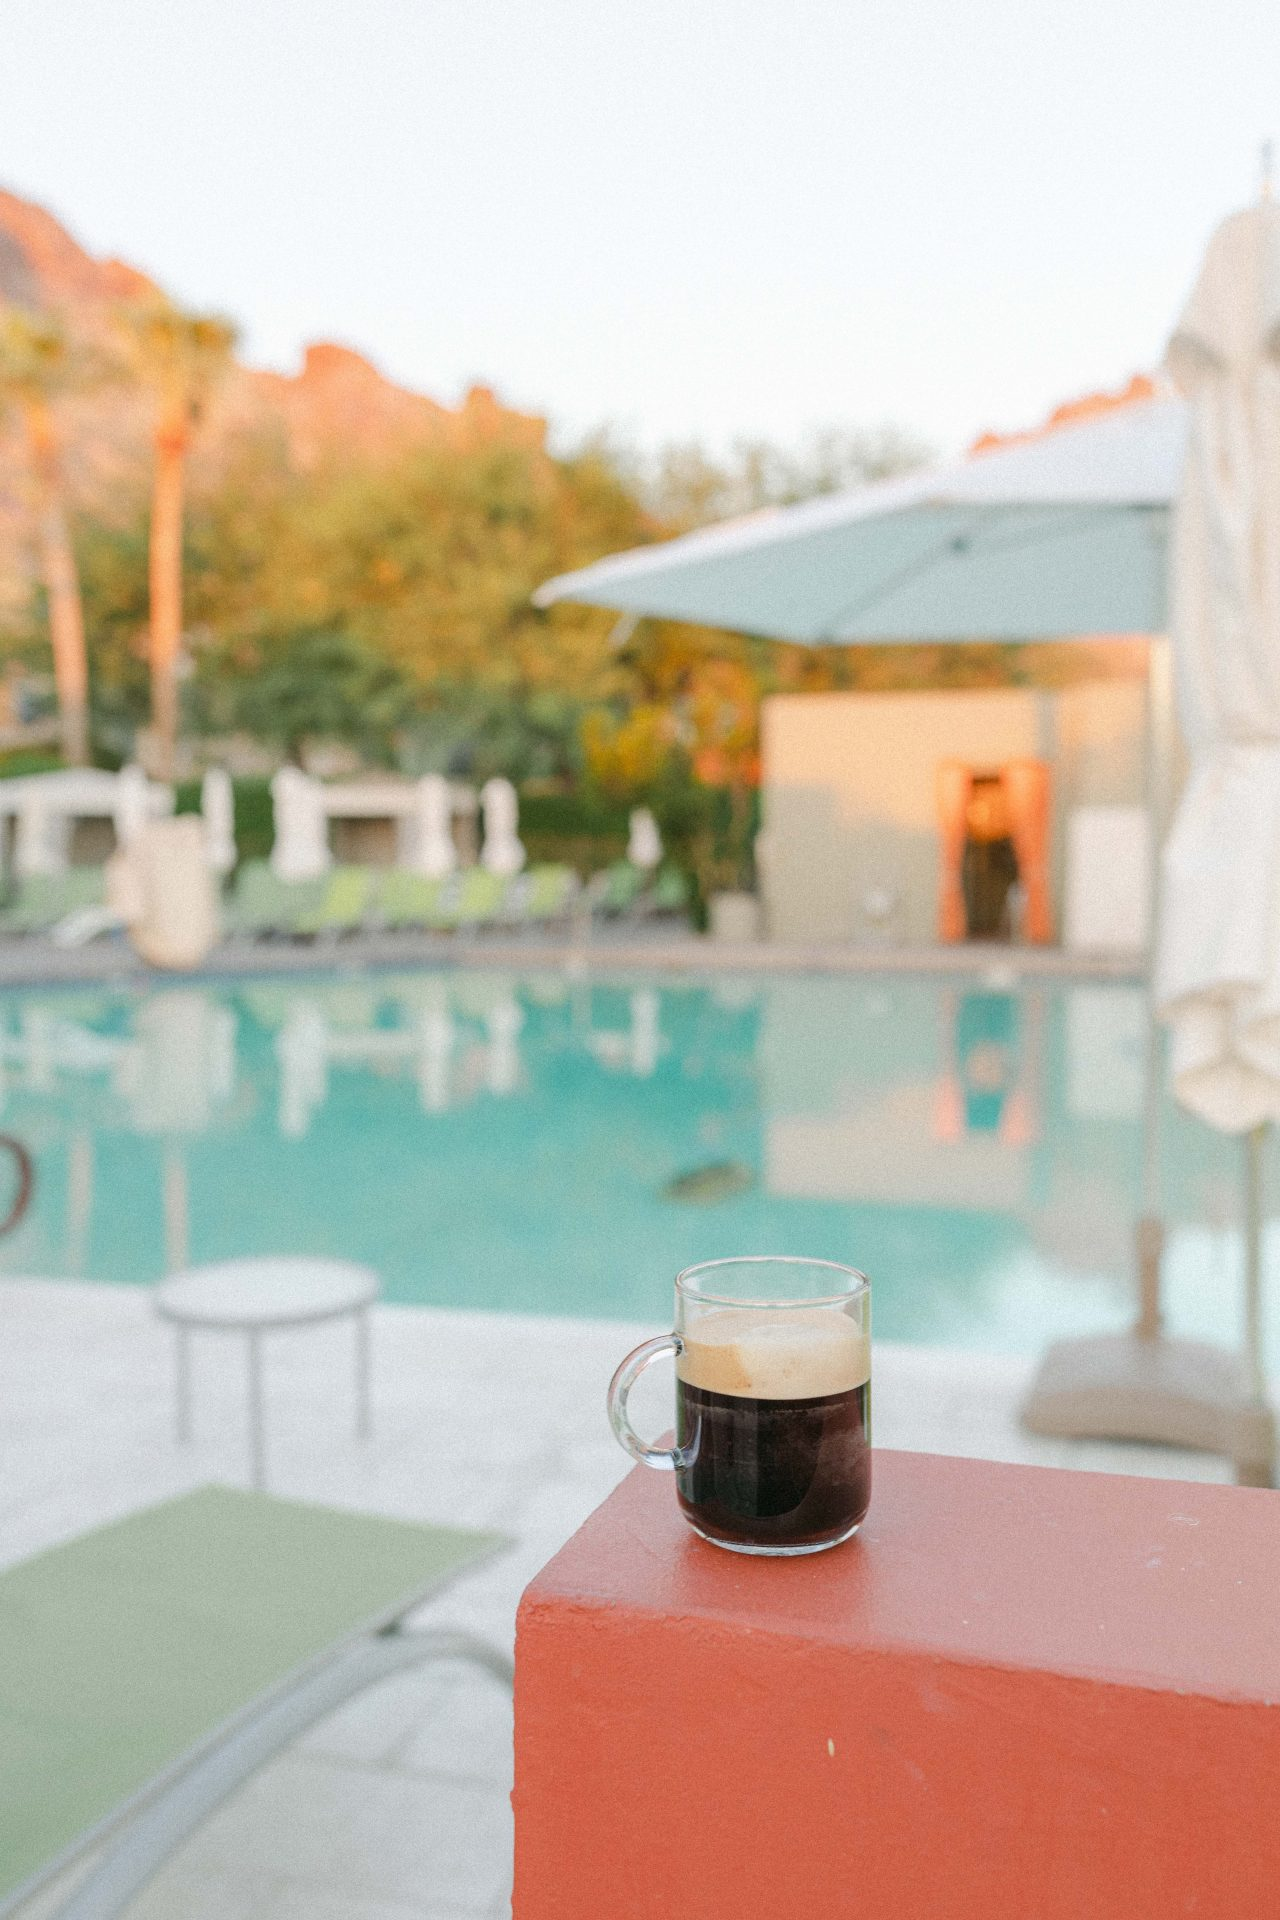 scottsdale travel guide, honeymoon in scottsdale, sanctuary resort, romantic, luxury hotel, spa, hotel, scottsdale Arizona travel guide, paradise, travel blogger, travel blog to scottsdale Arizona, where to stay in scottsdale Arizona